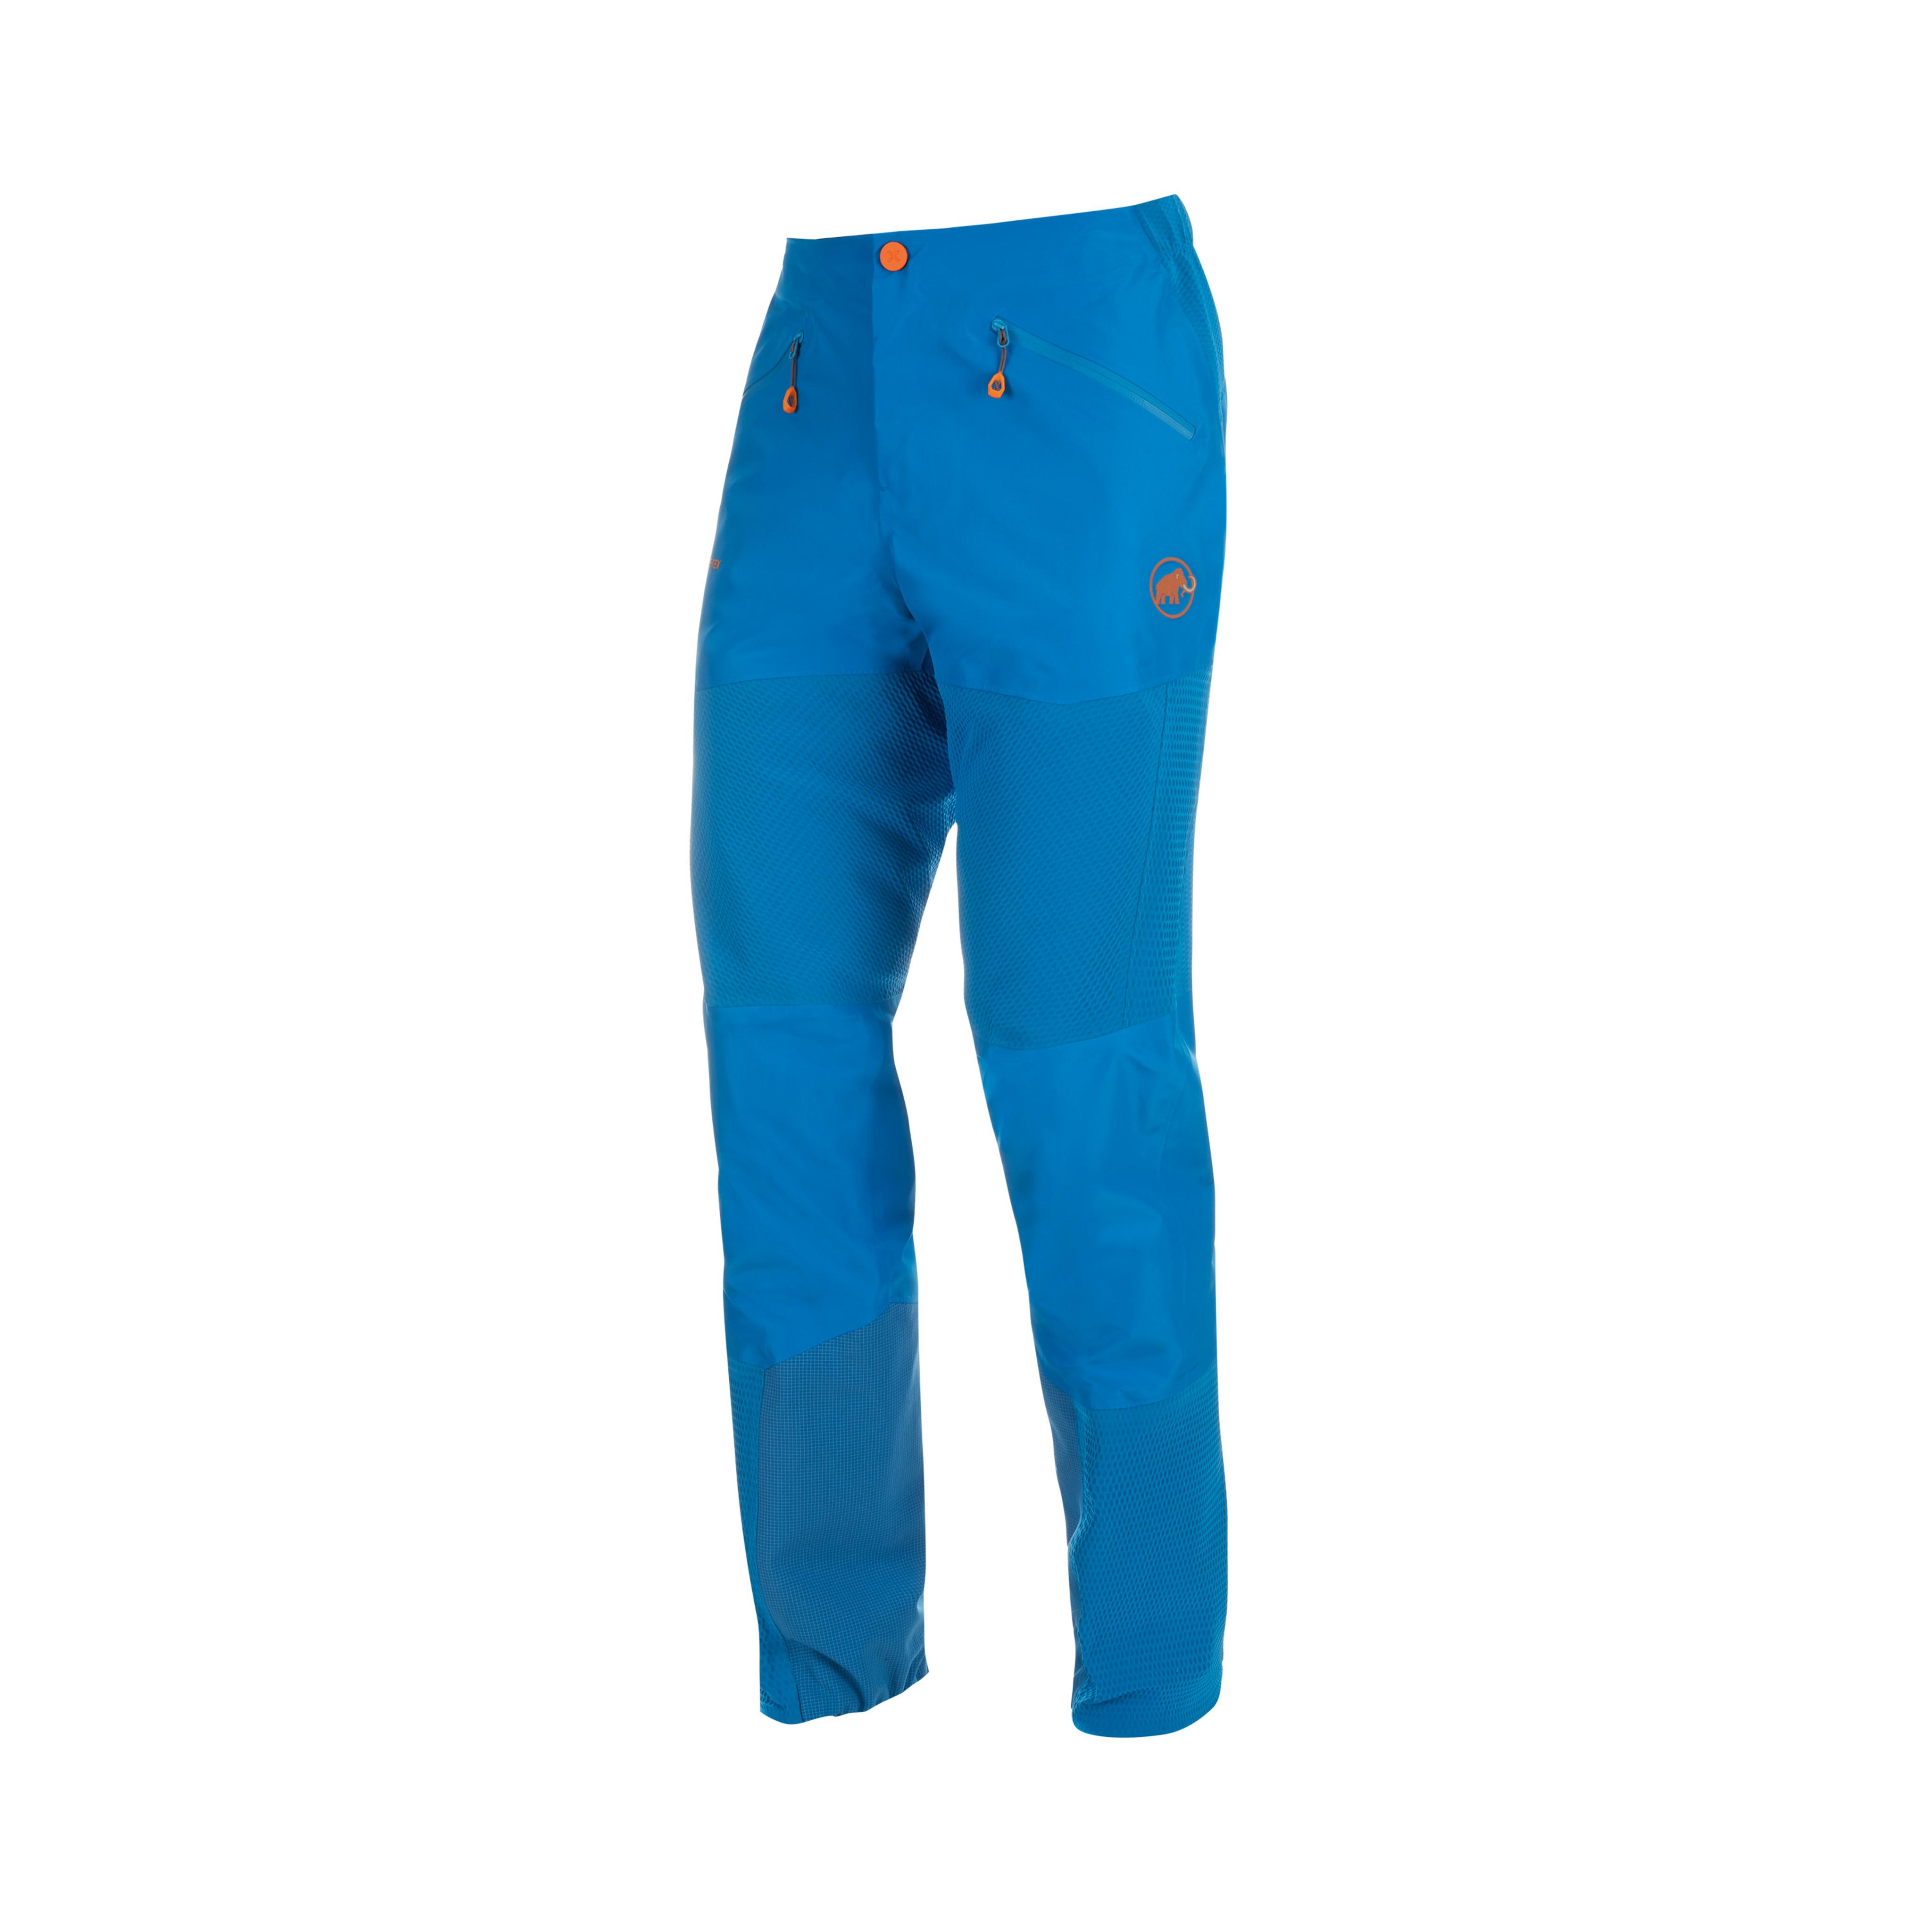 Nordwand HS Flex Pants Men - ice, normal, UK 28 thumbnail